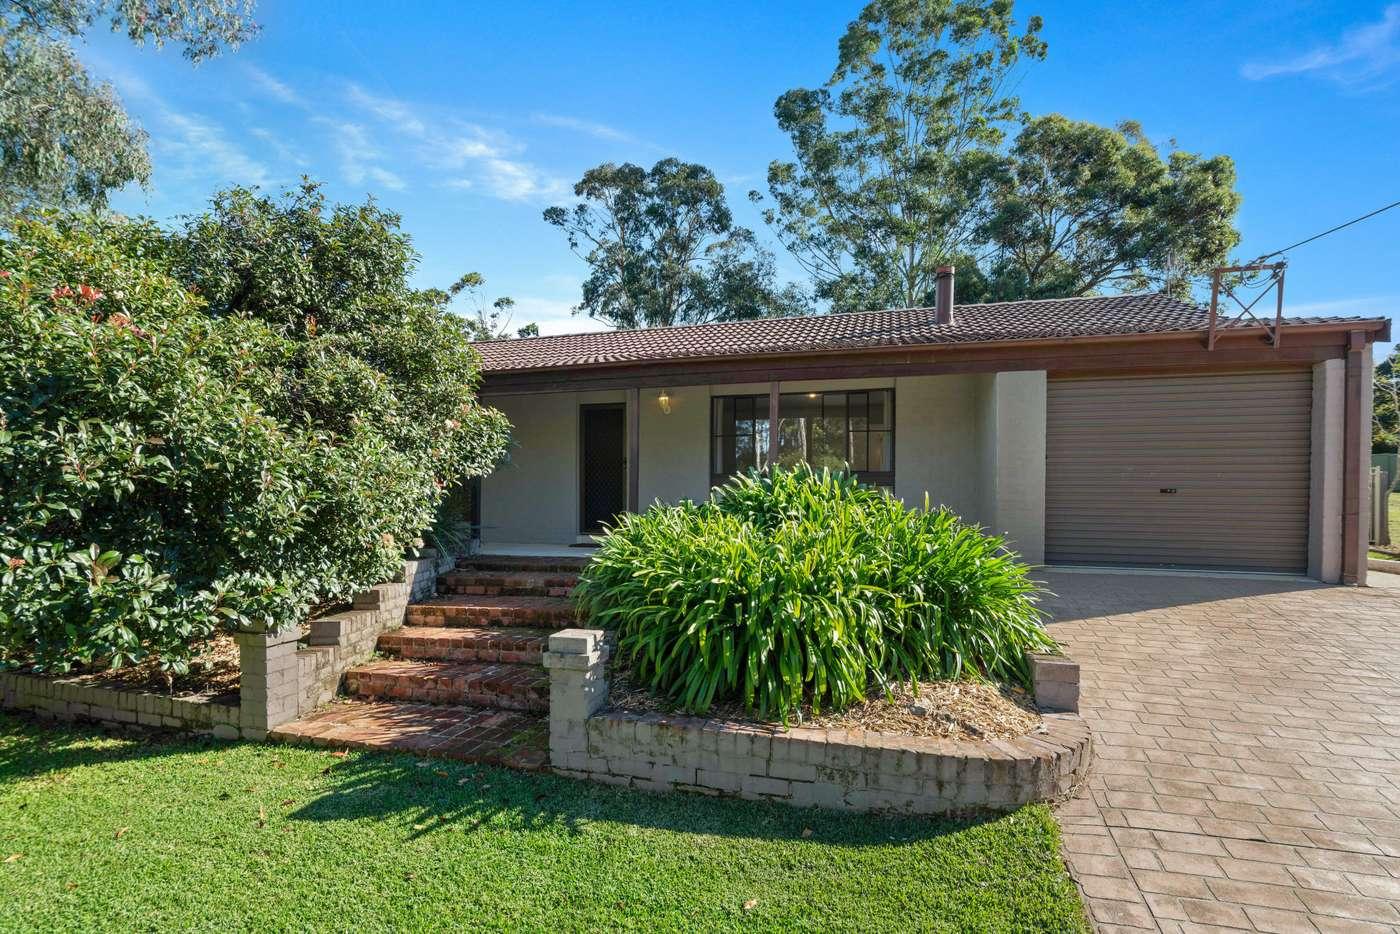 Main view of Homely house listing, 19 Hockeys Lane, Cambewarra NSW 2540